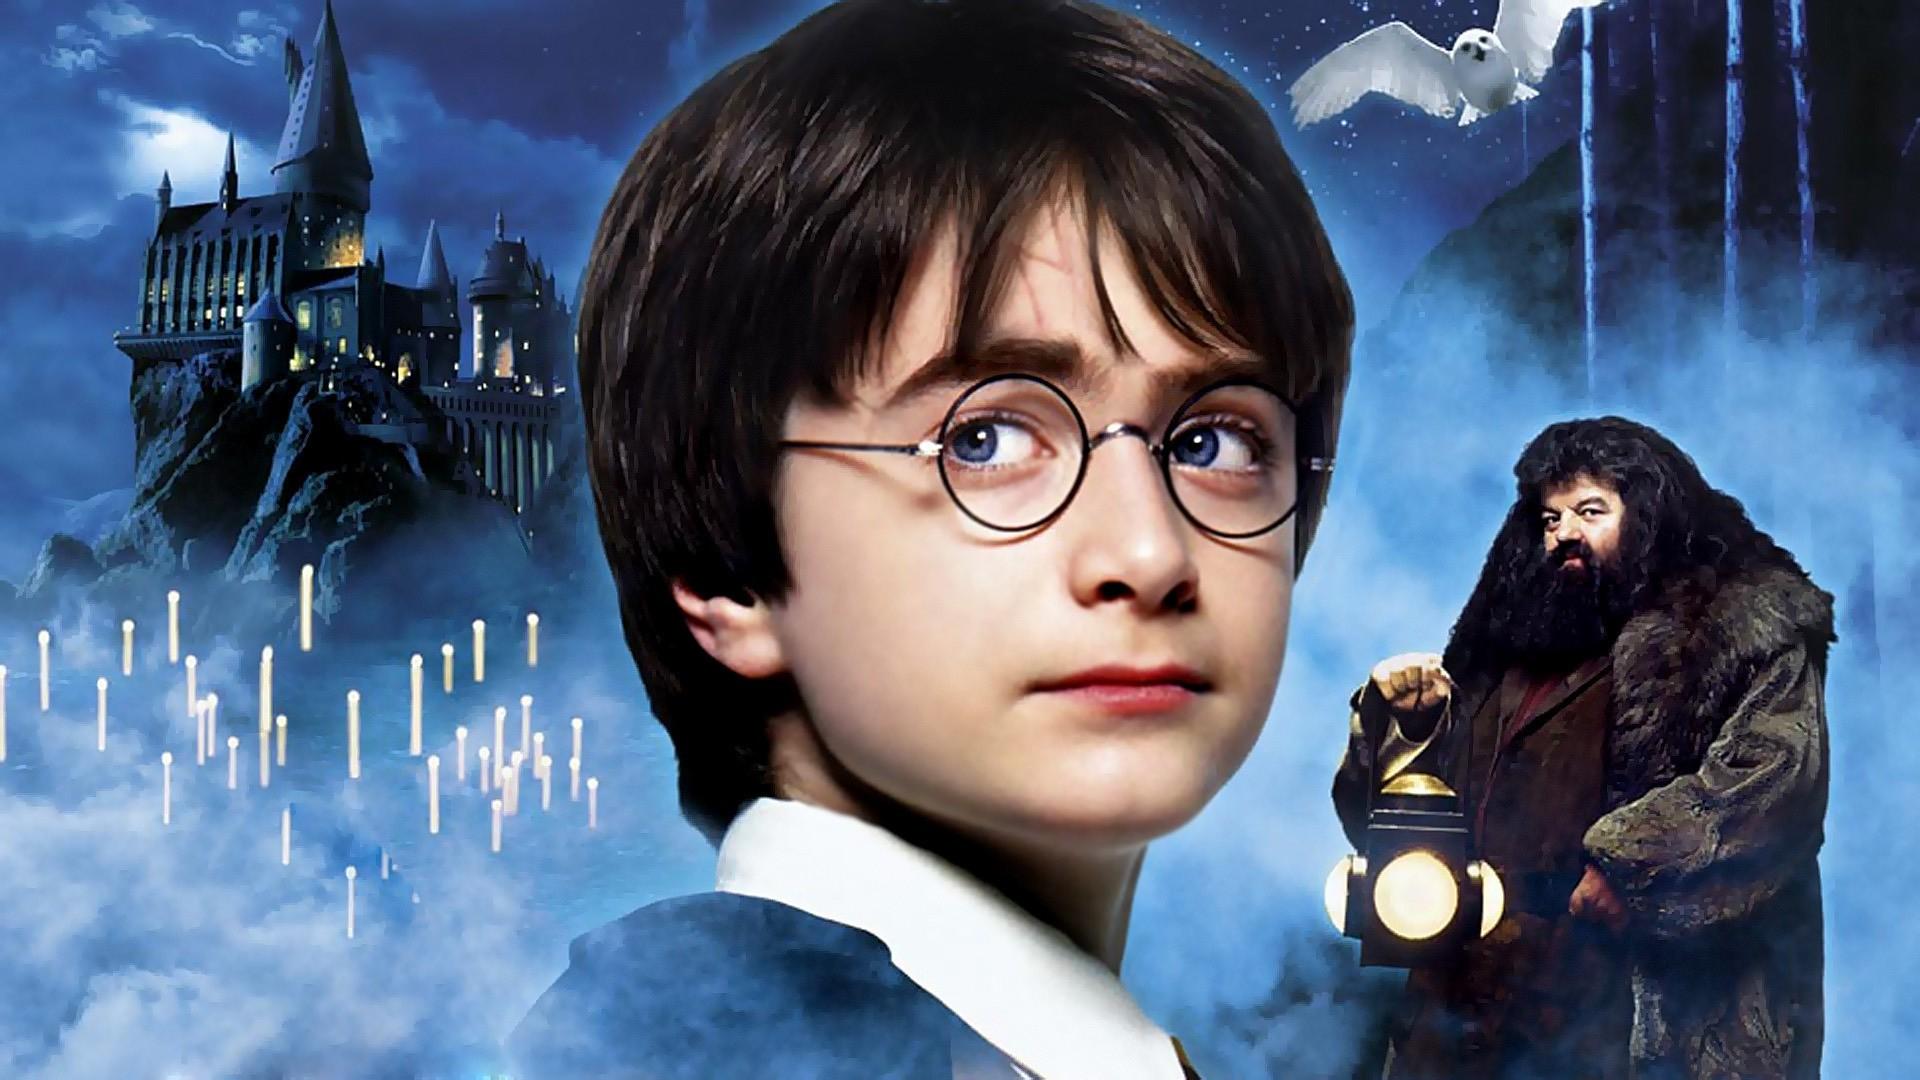 Wonderful Wallpaper Harry Potter Portrait - illustration-anime-lantern-candles-castle-Harry-Potter-poster-Hogwarts-Daniel-Radcliffe-screenshot-1920x1080-px-computer-wallpaper-album-cover-photomontage-harry-potter-and-the-sorcerers-stone-522428  Pic_964483.jpg